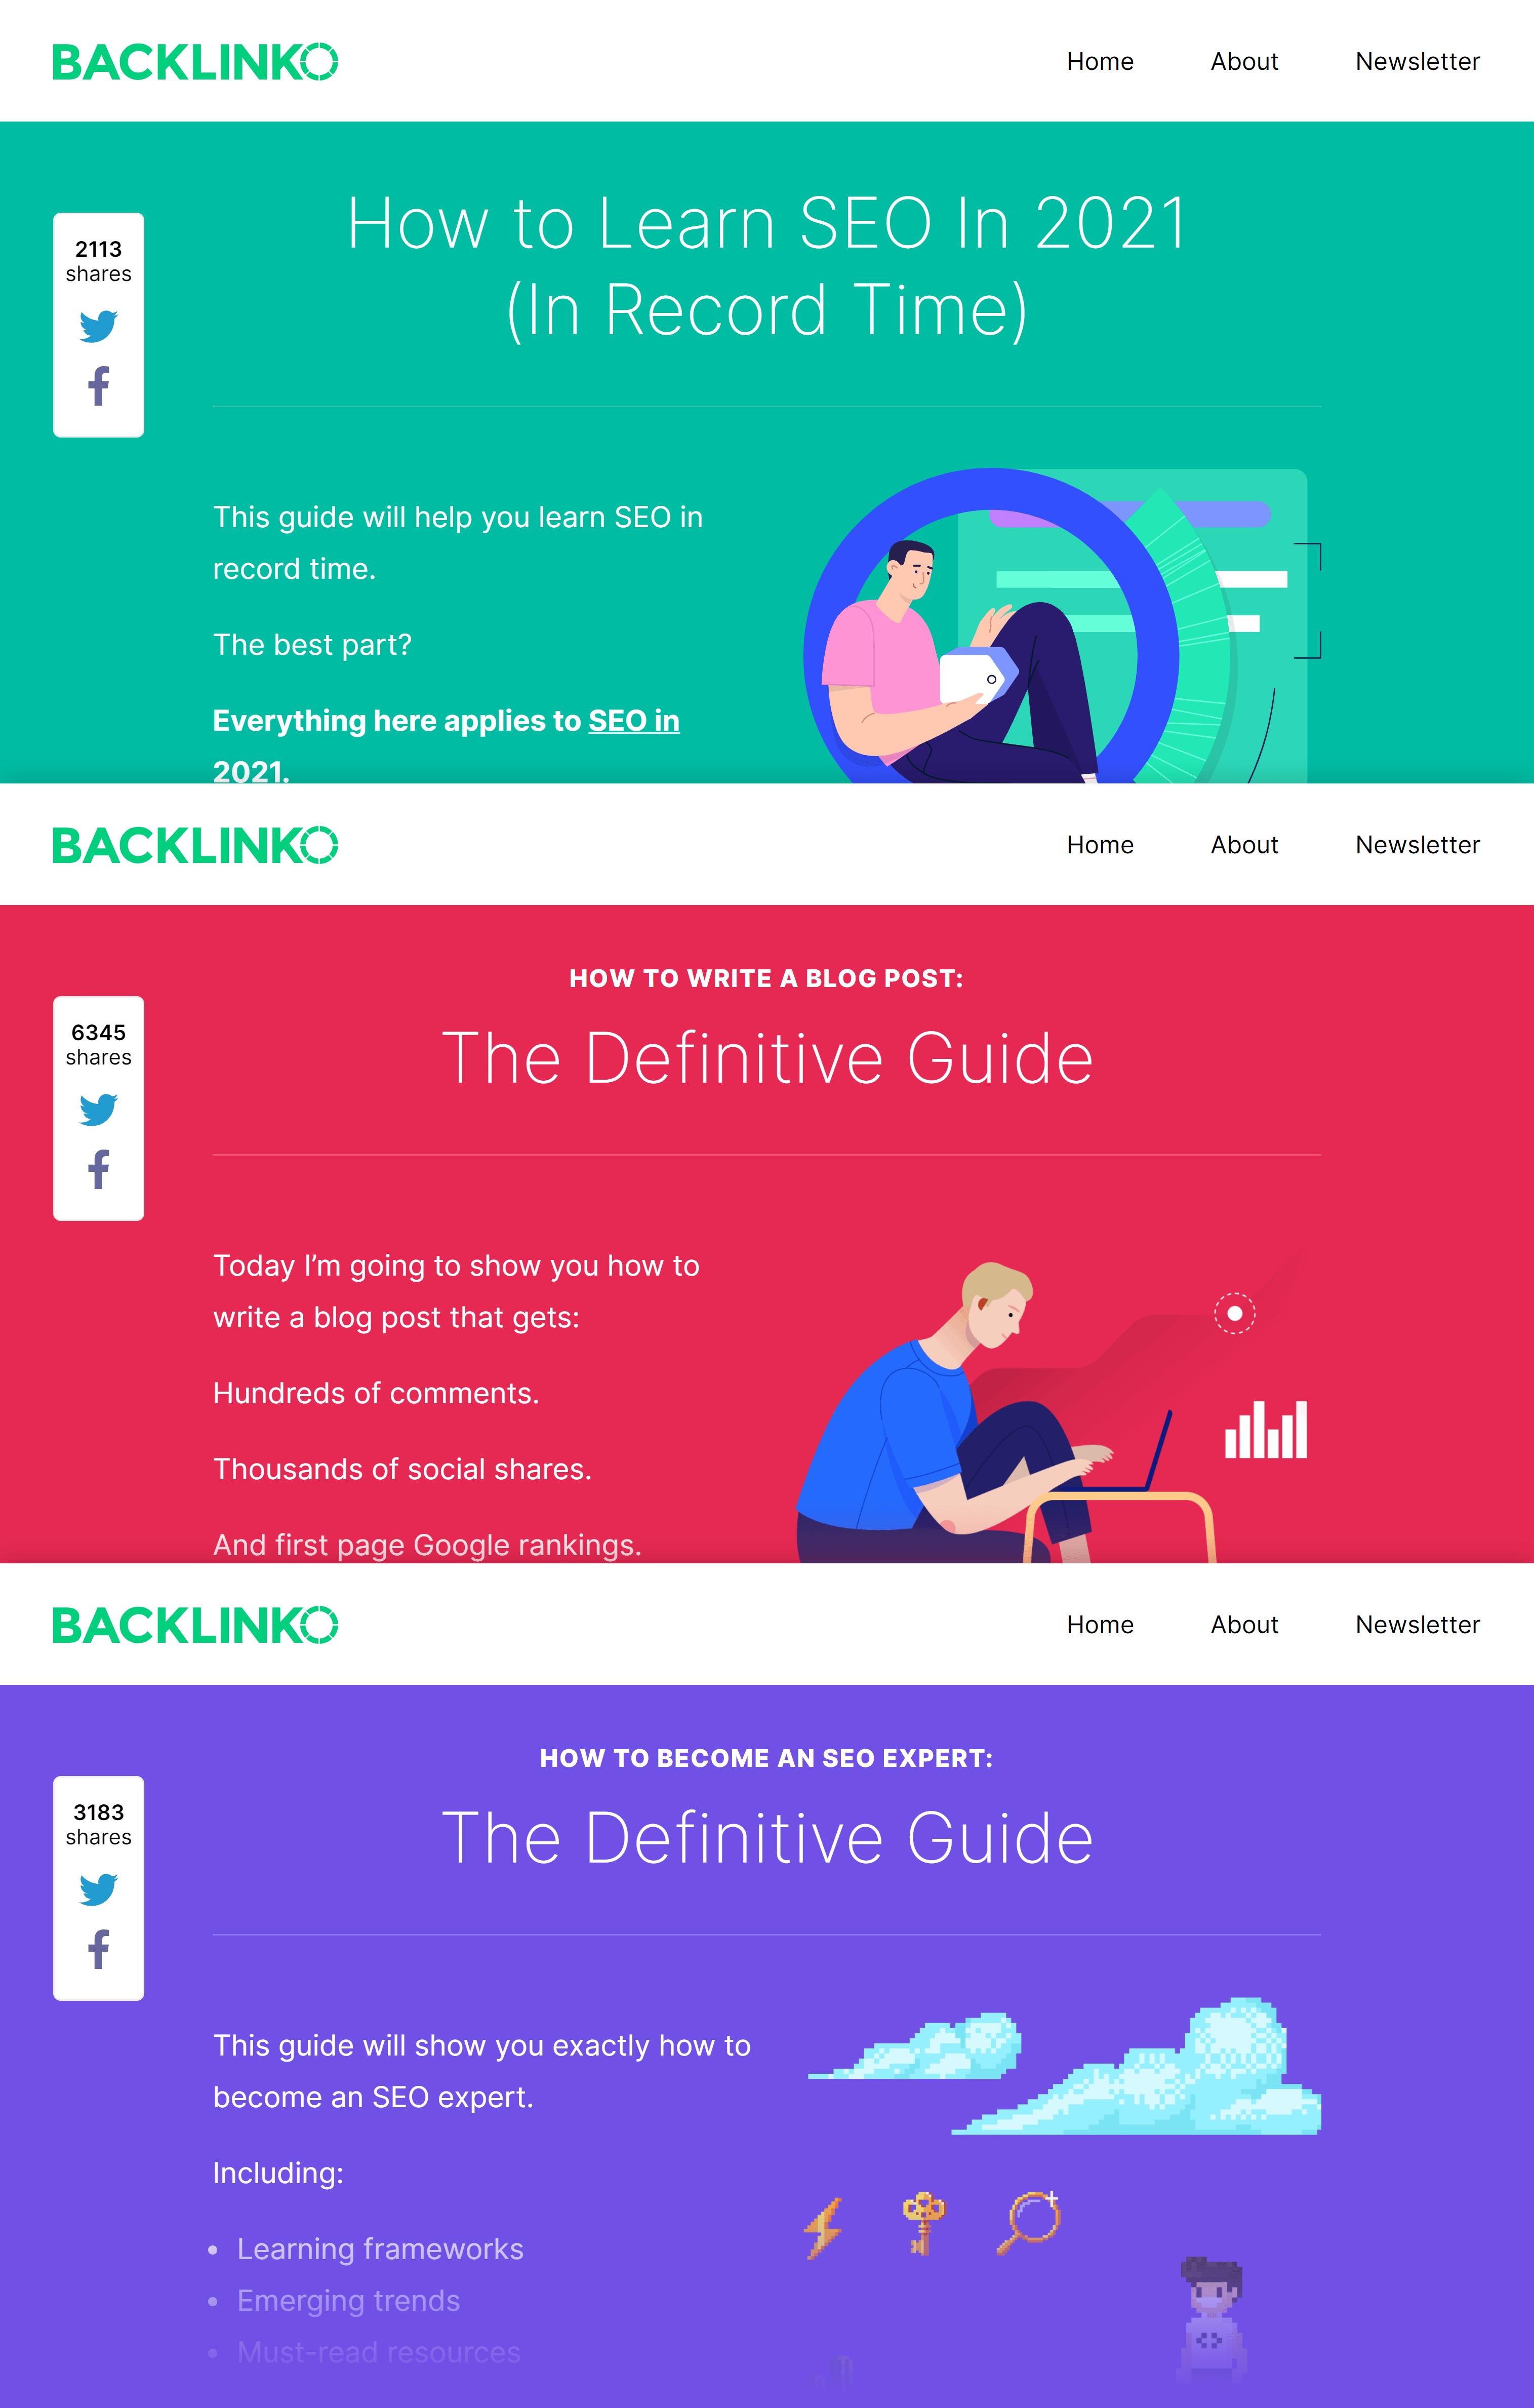 Backlinko content collage